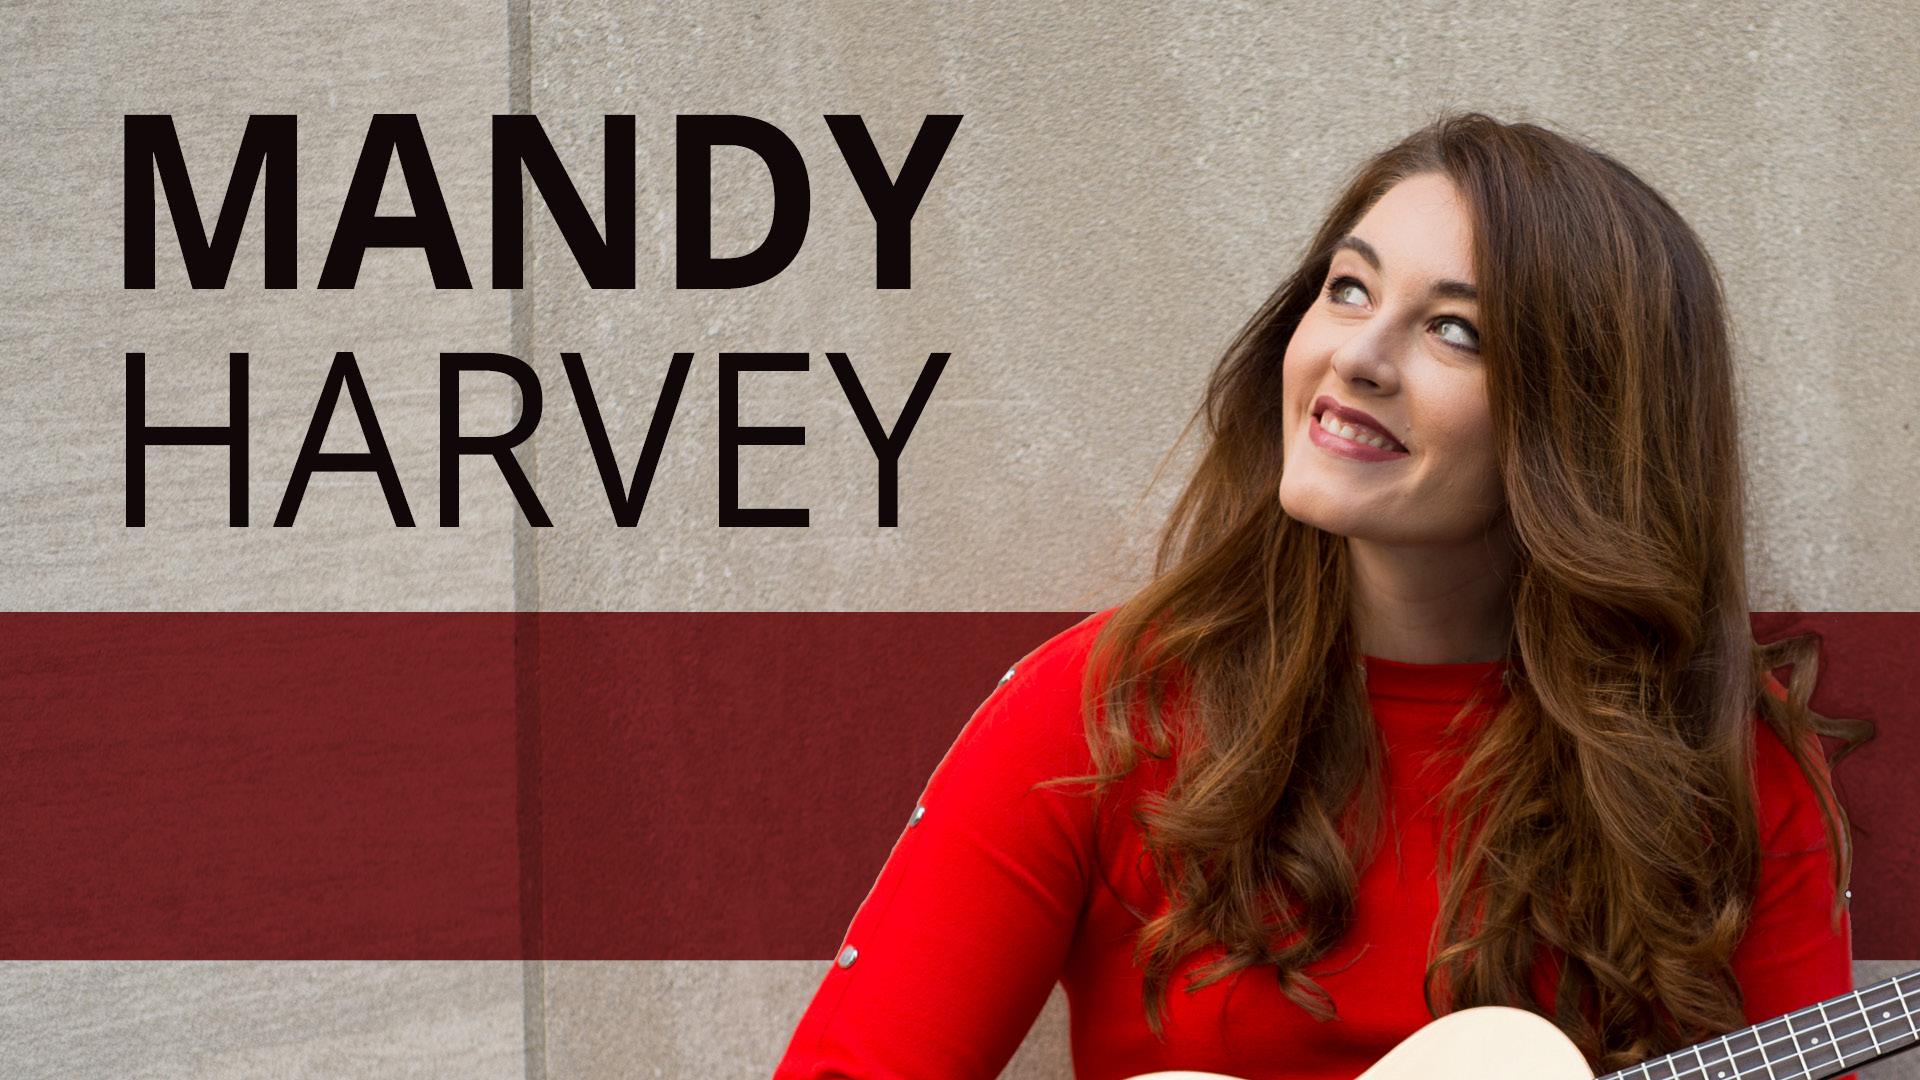 Mandy Harvey SS Wide.jpg